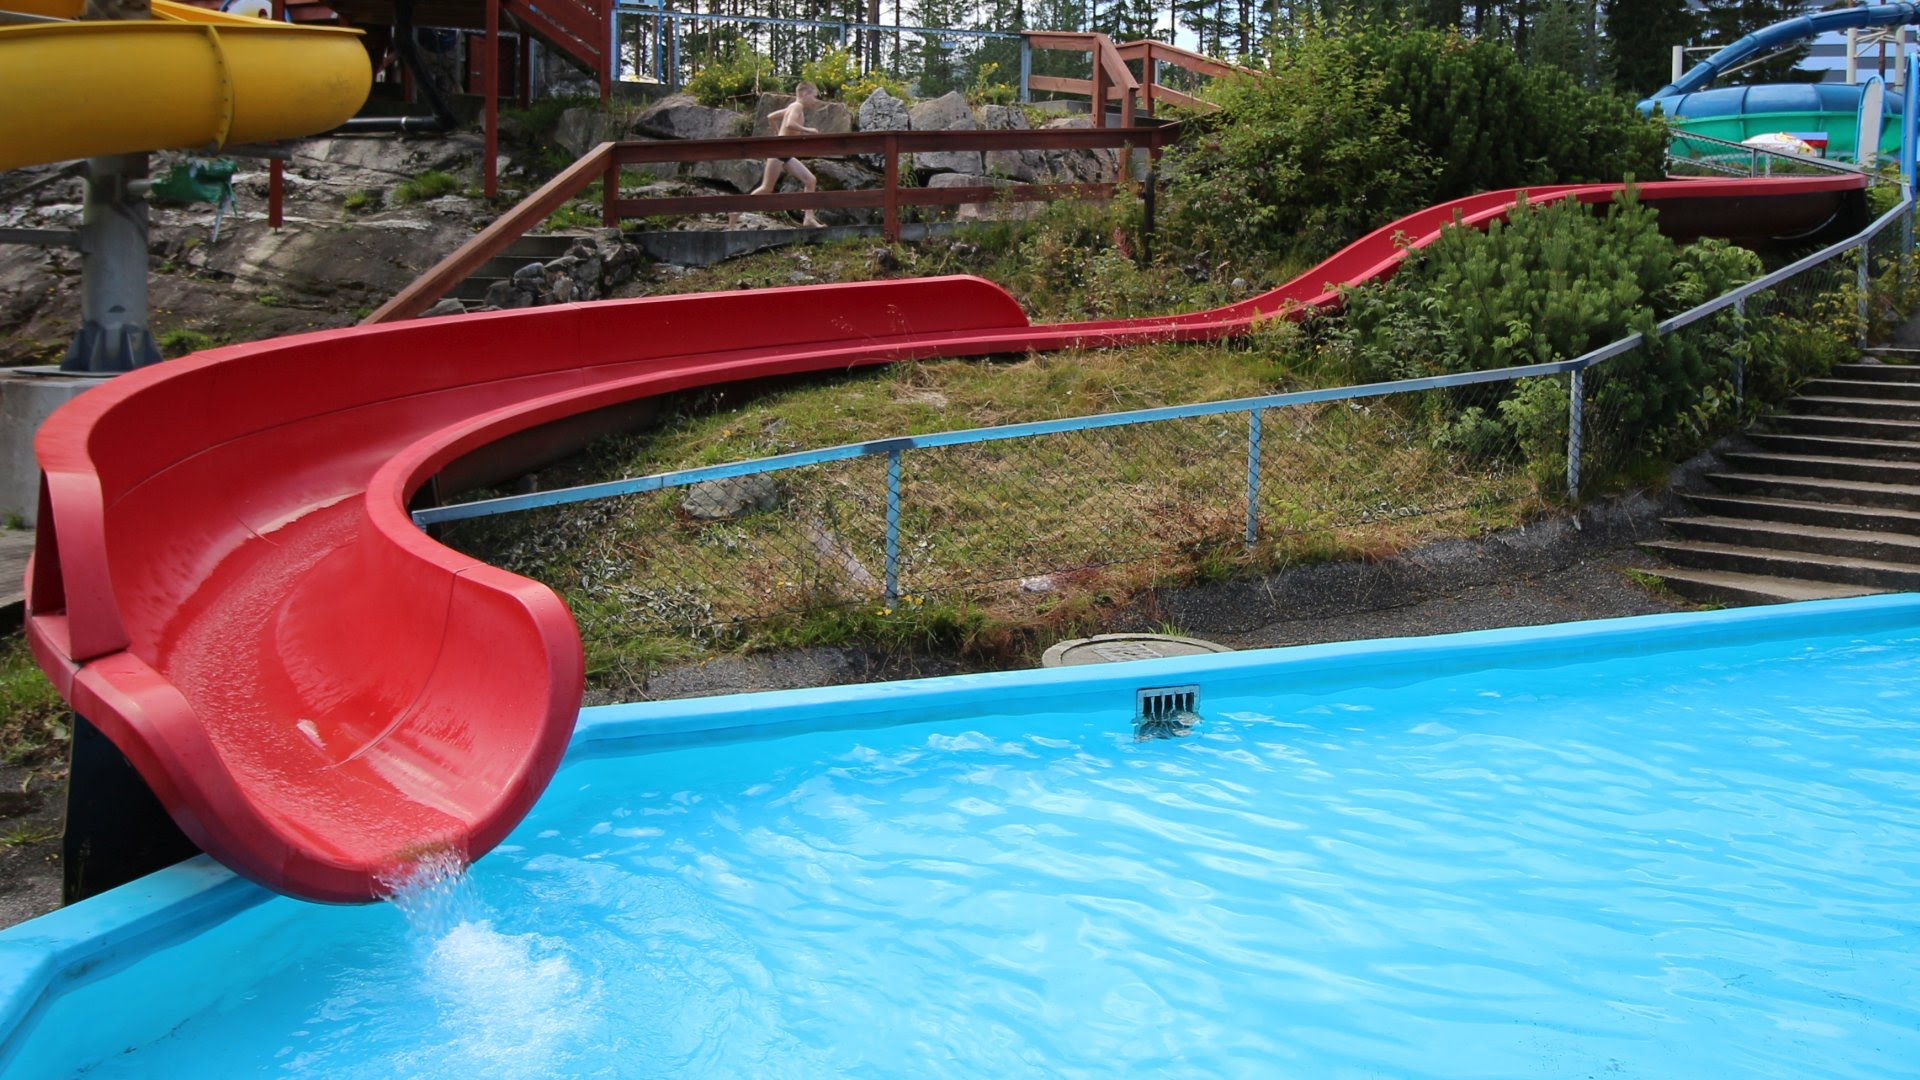 offene Kinderrutsche | Bø Sommarland Norwegen